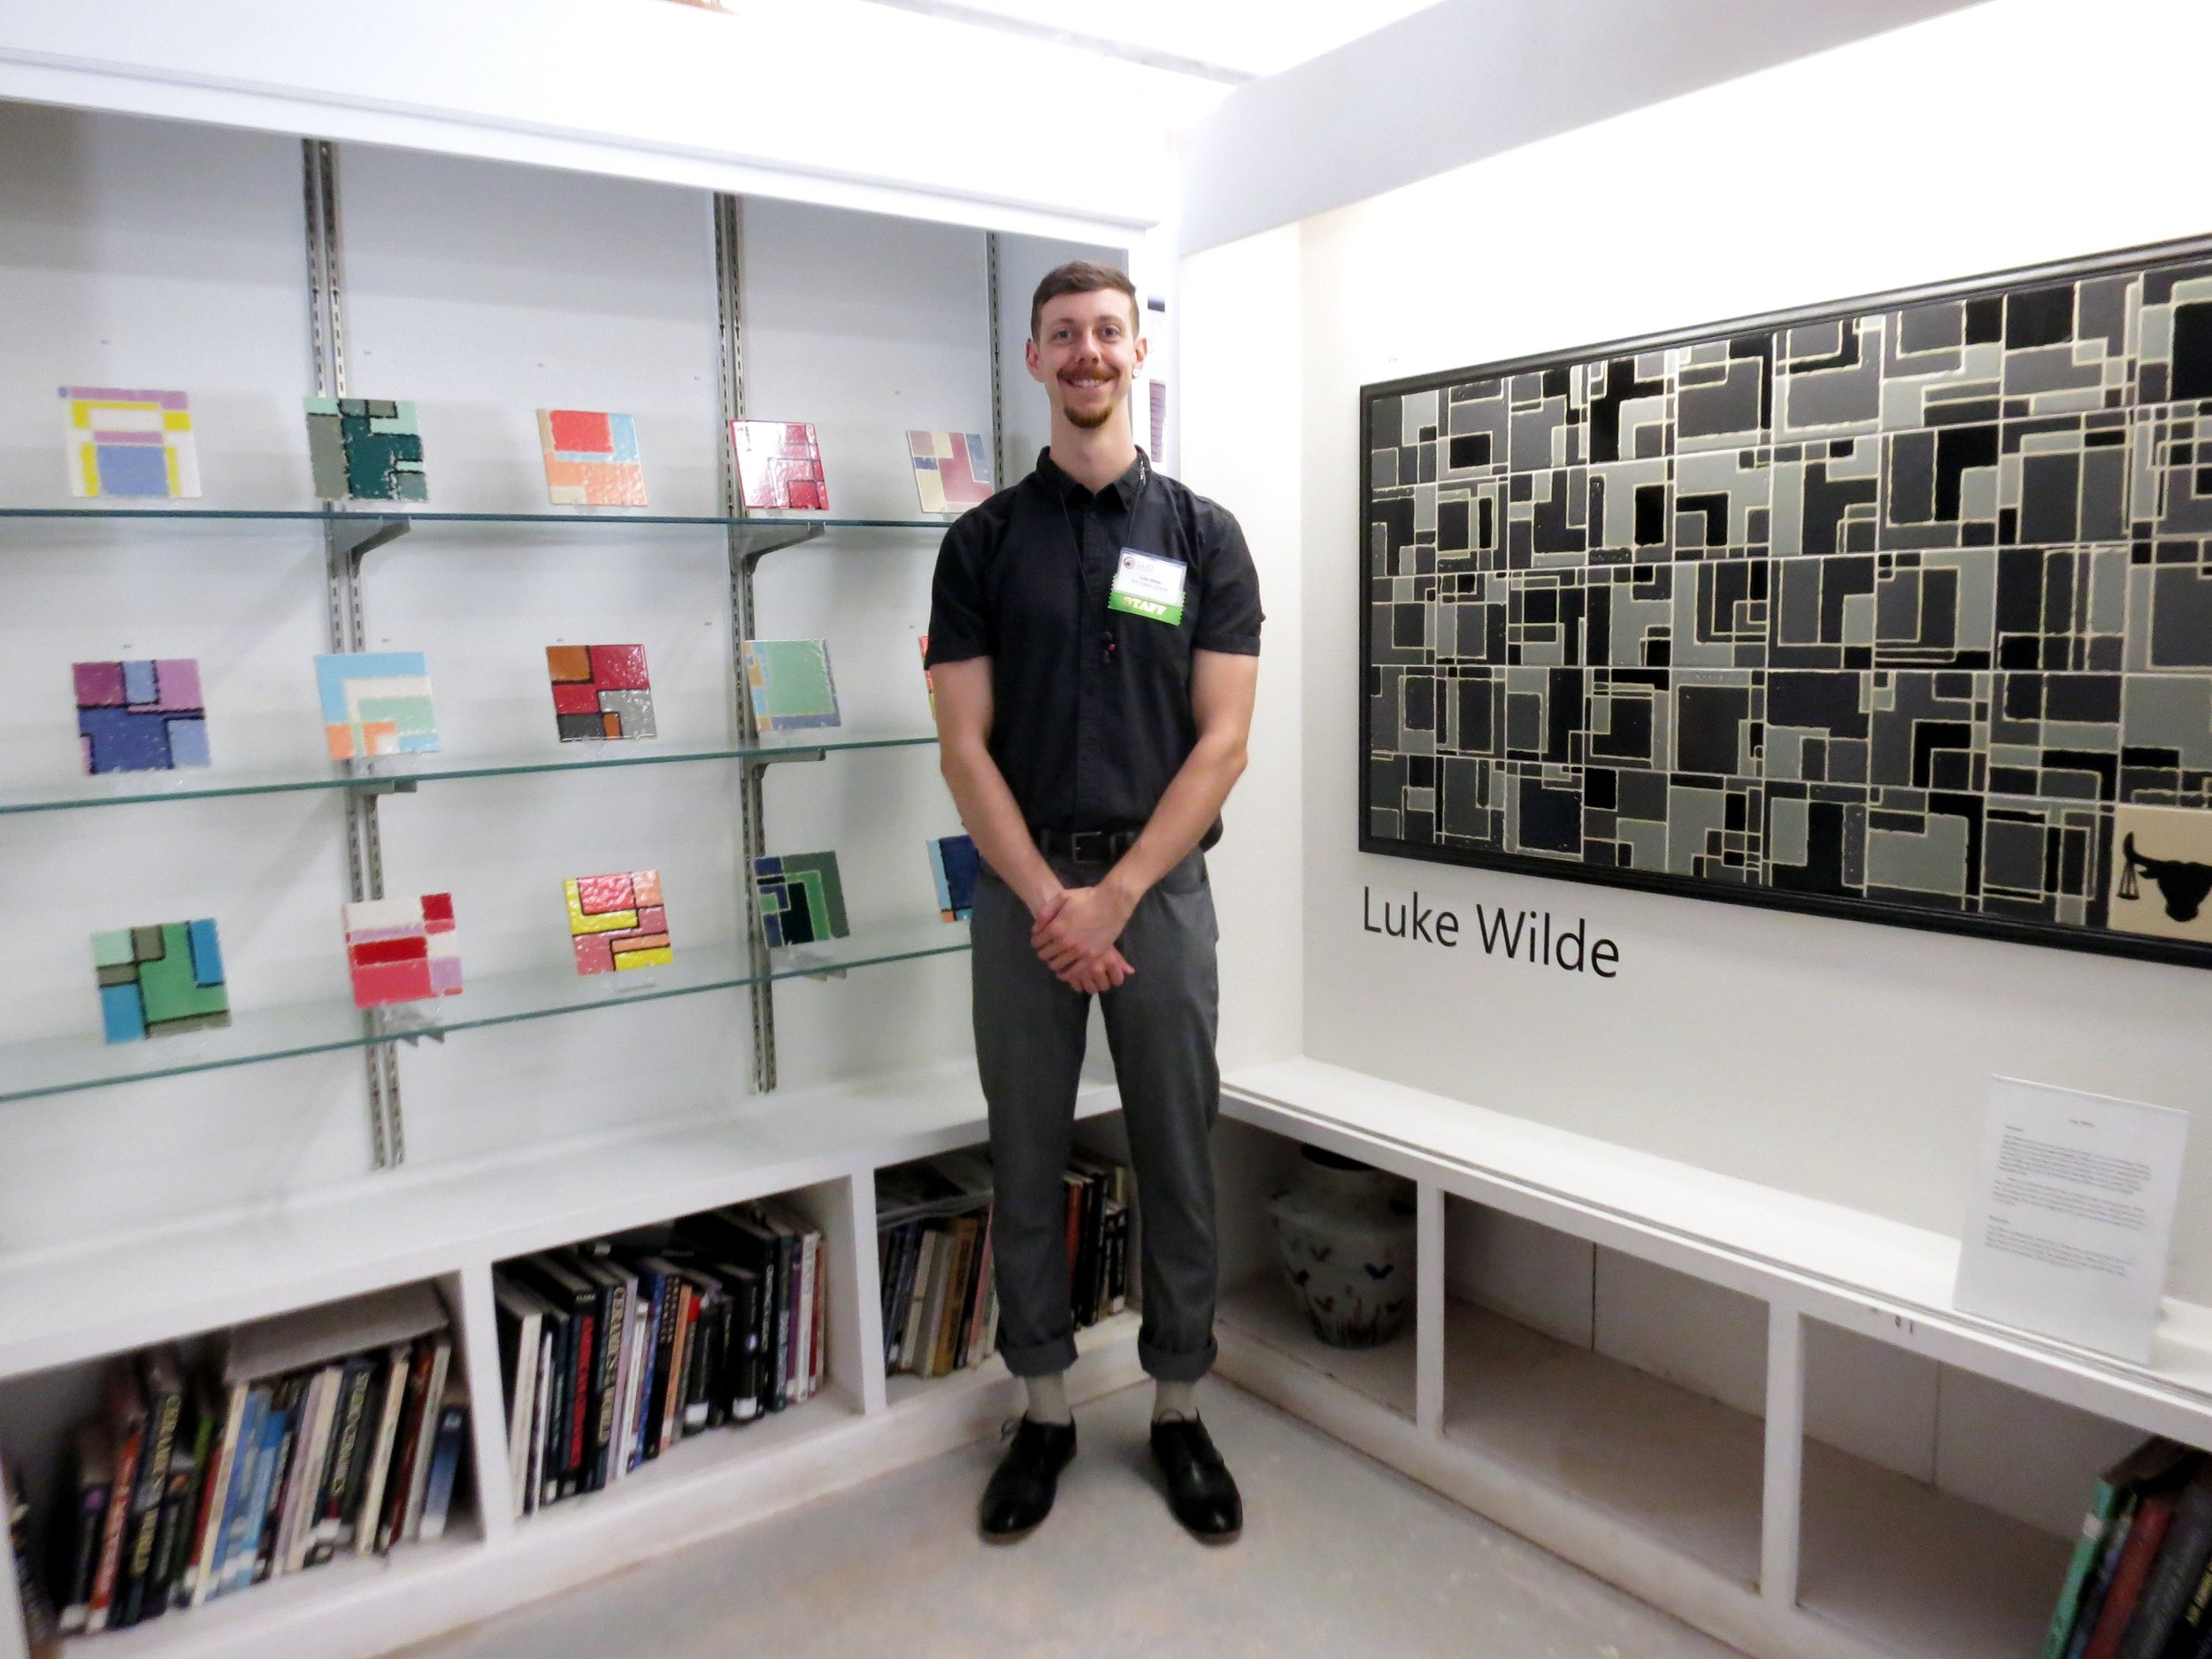 Luke Wilde Exhibit June 2019.JPG